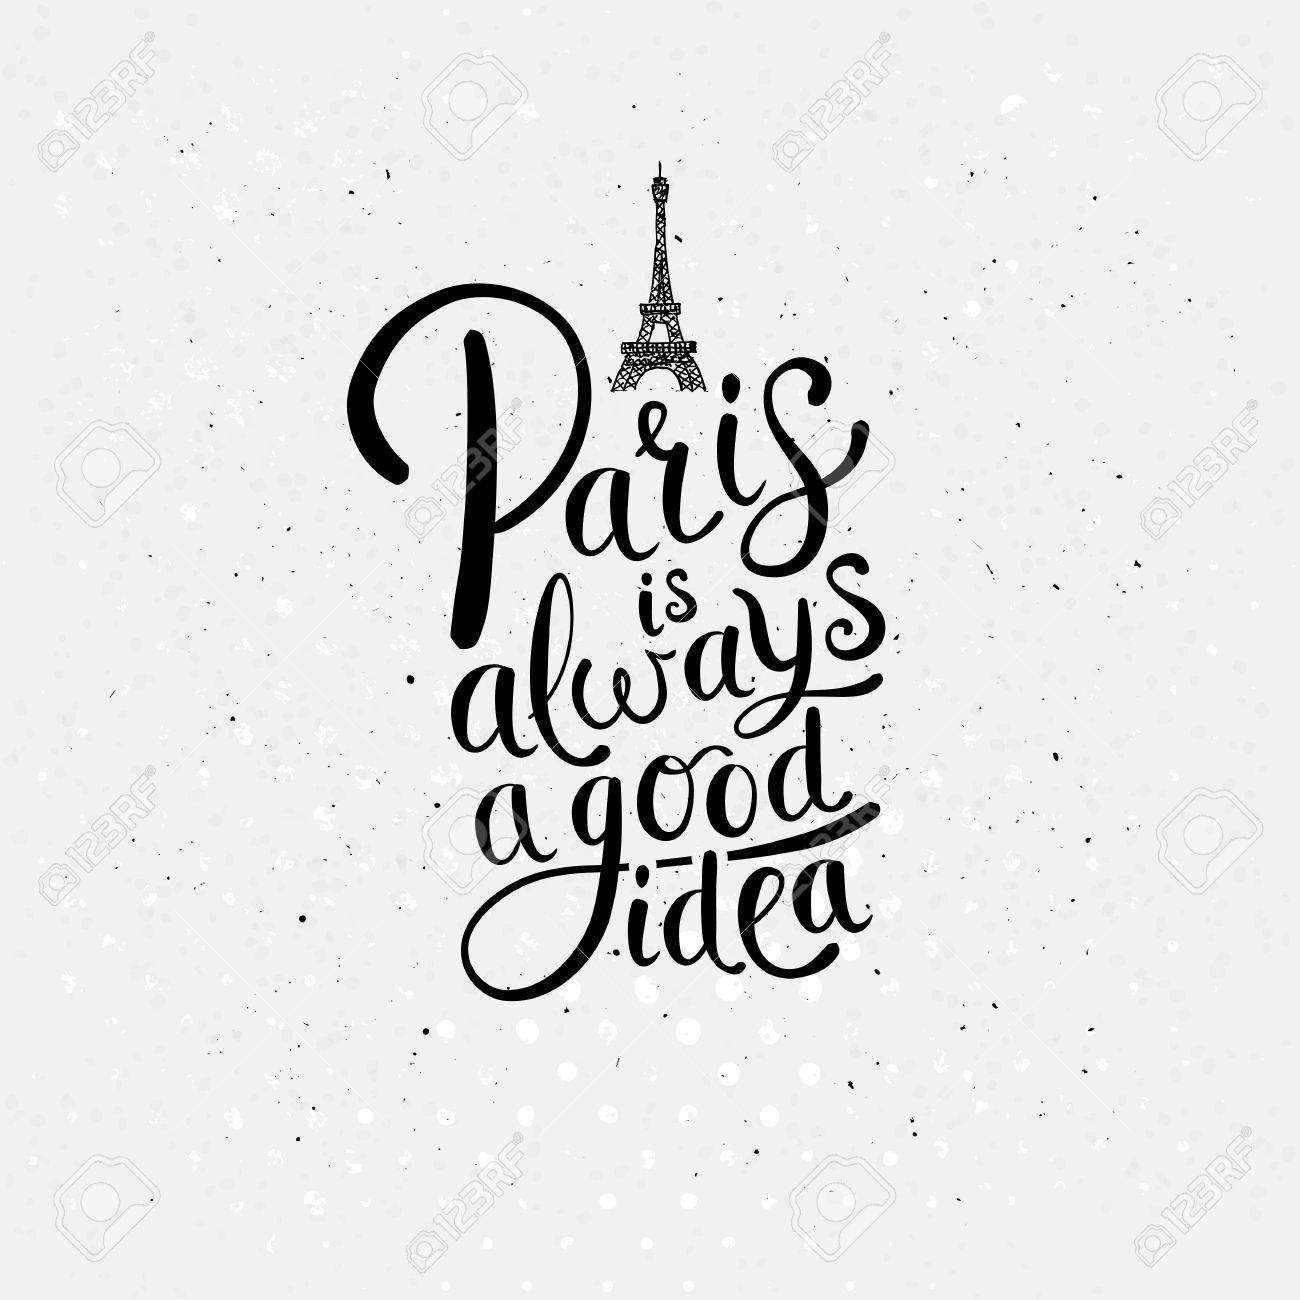 1300x1300 Simple Graphic Design For Paris Is Always A Good Idea Concept